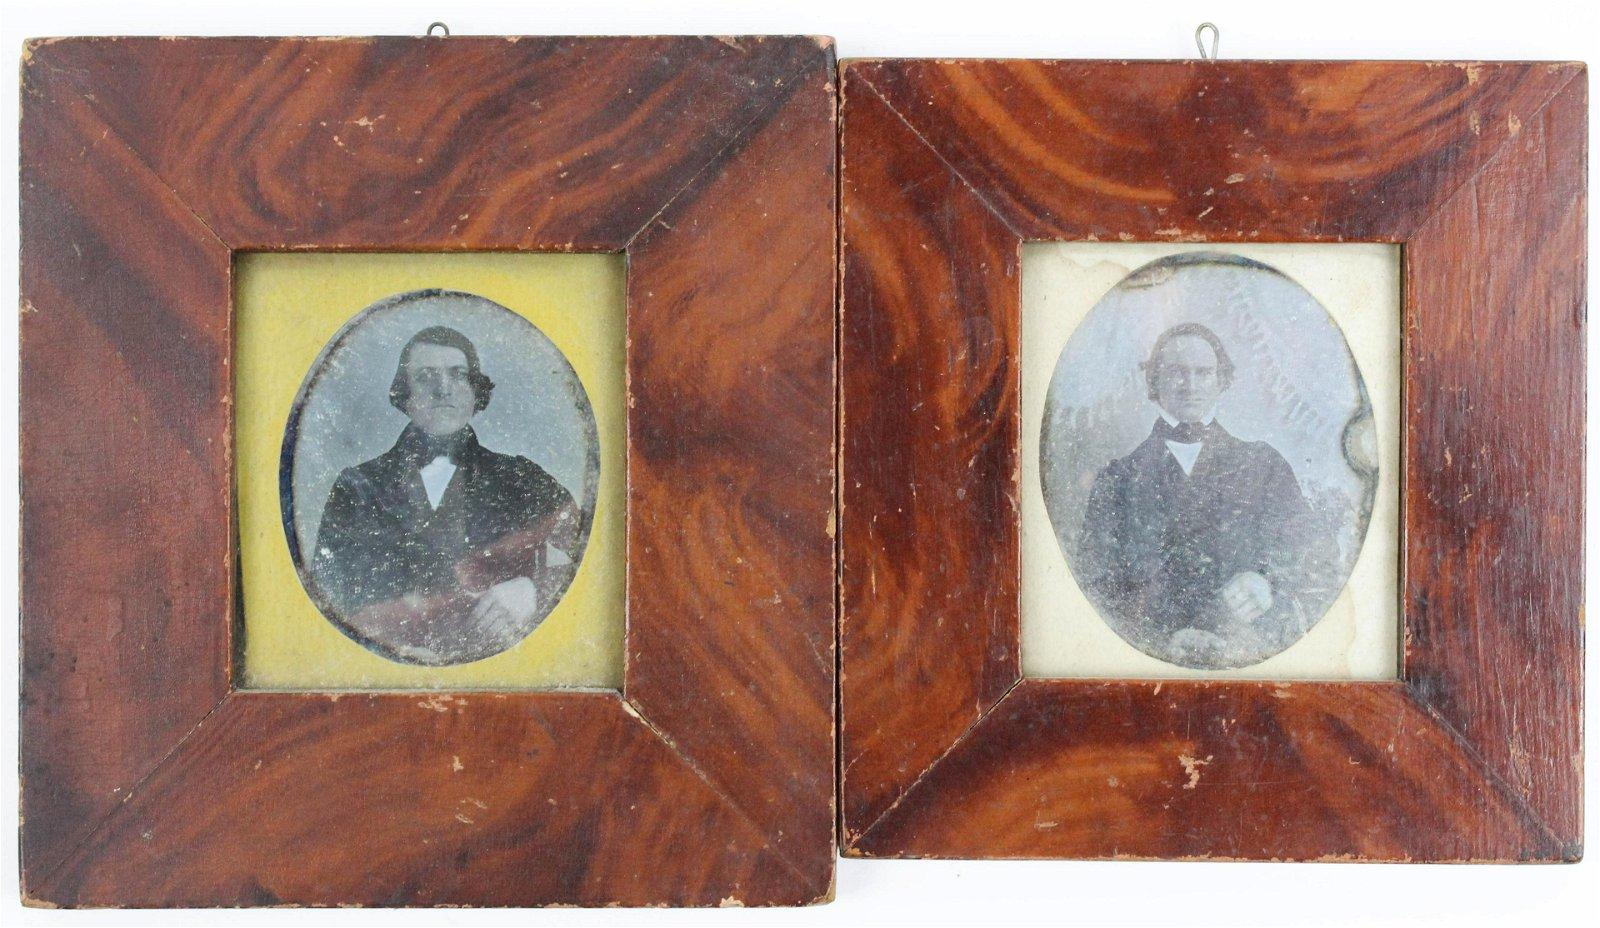 Warren Pooler Sr Framed Daguerreotypes